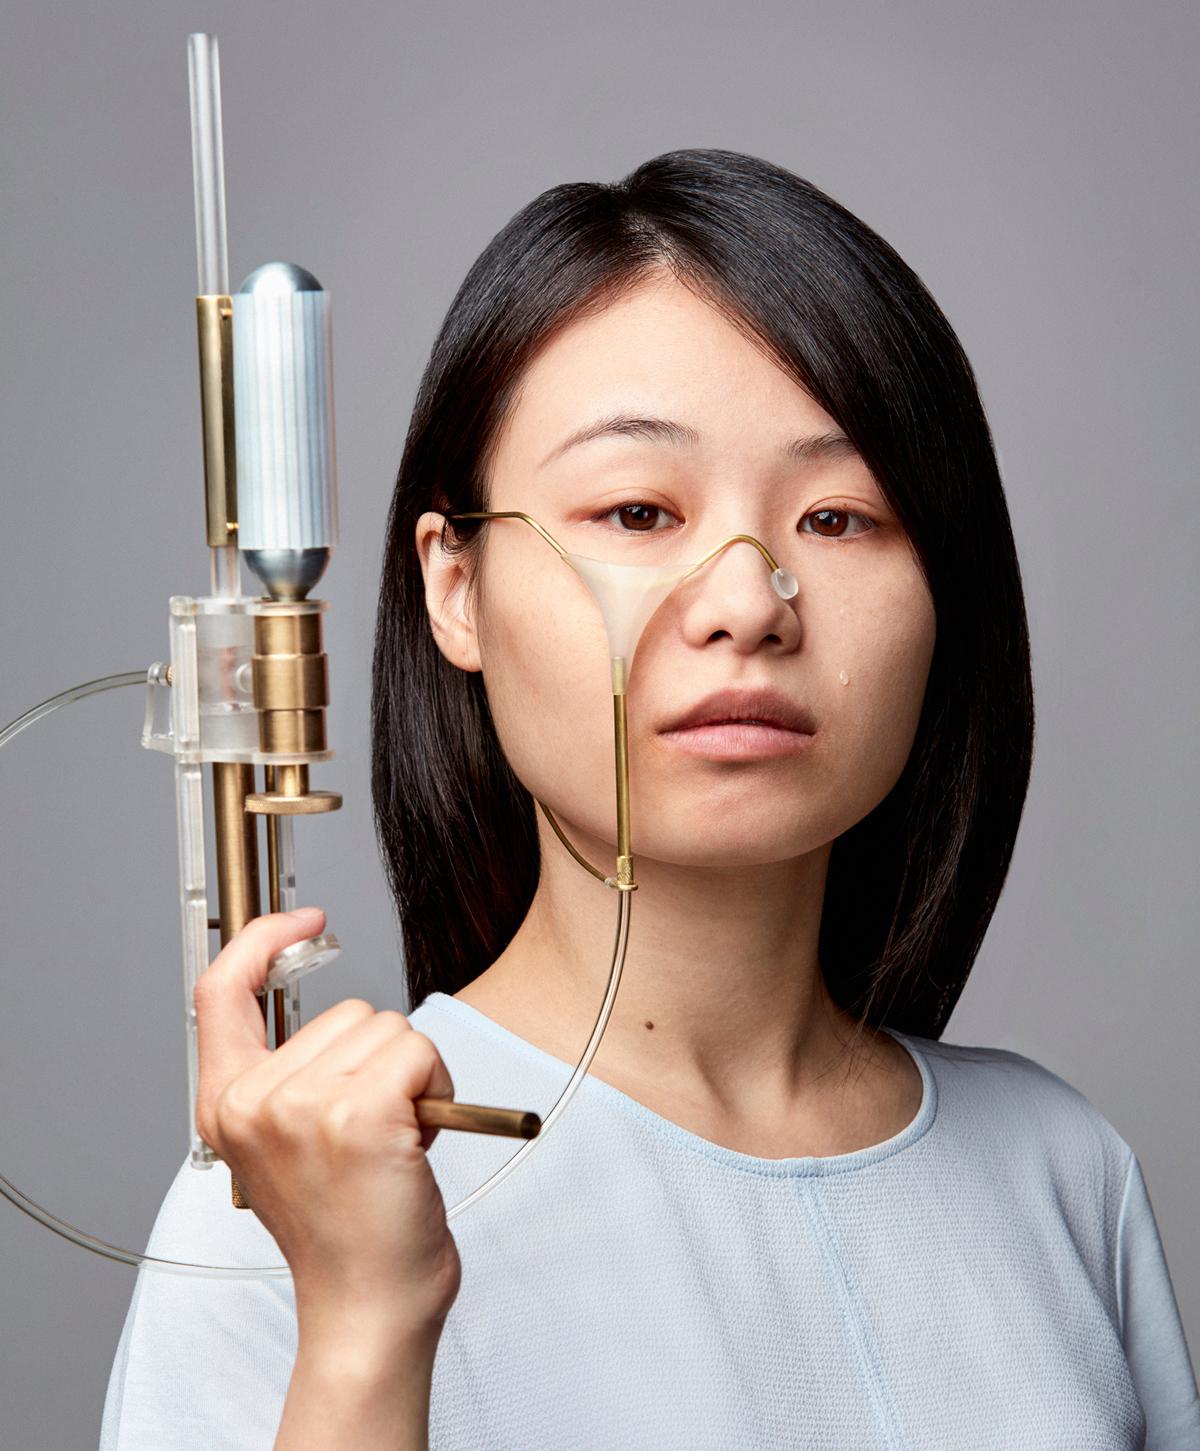 tear-gun-coneptual-product-design-yi-fei-chen-dutch-design-wekk-2016_dezeen_col_1